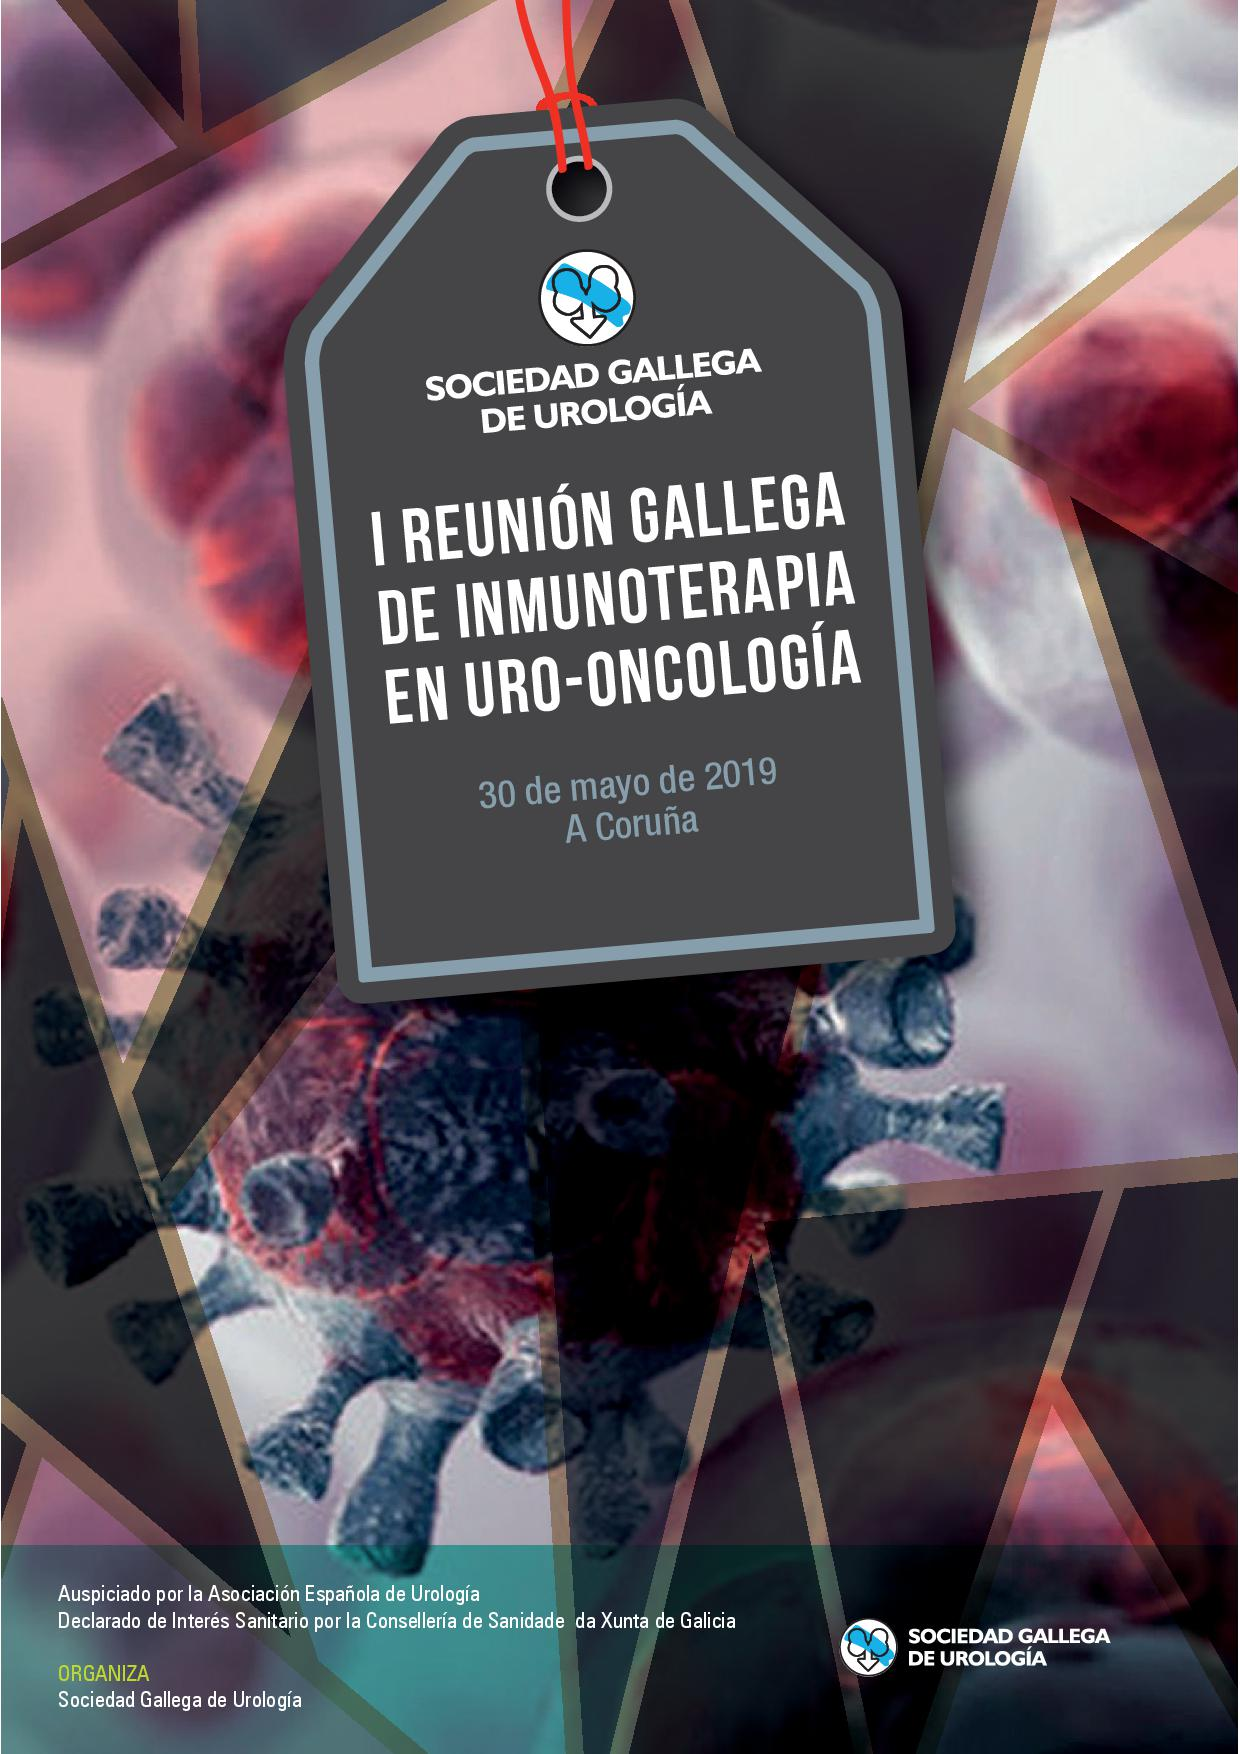 I REUNIÓN GALLEGA DE INMUNOTERAPIA EN URO-ONCOLOGÍA